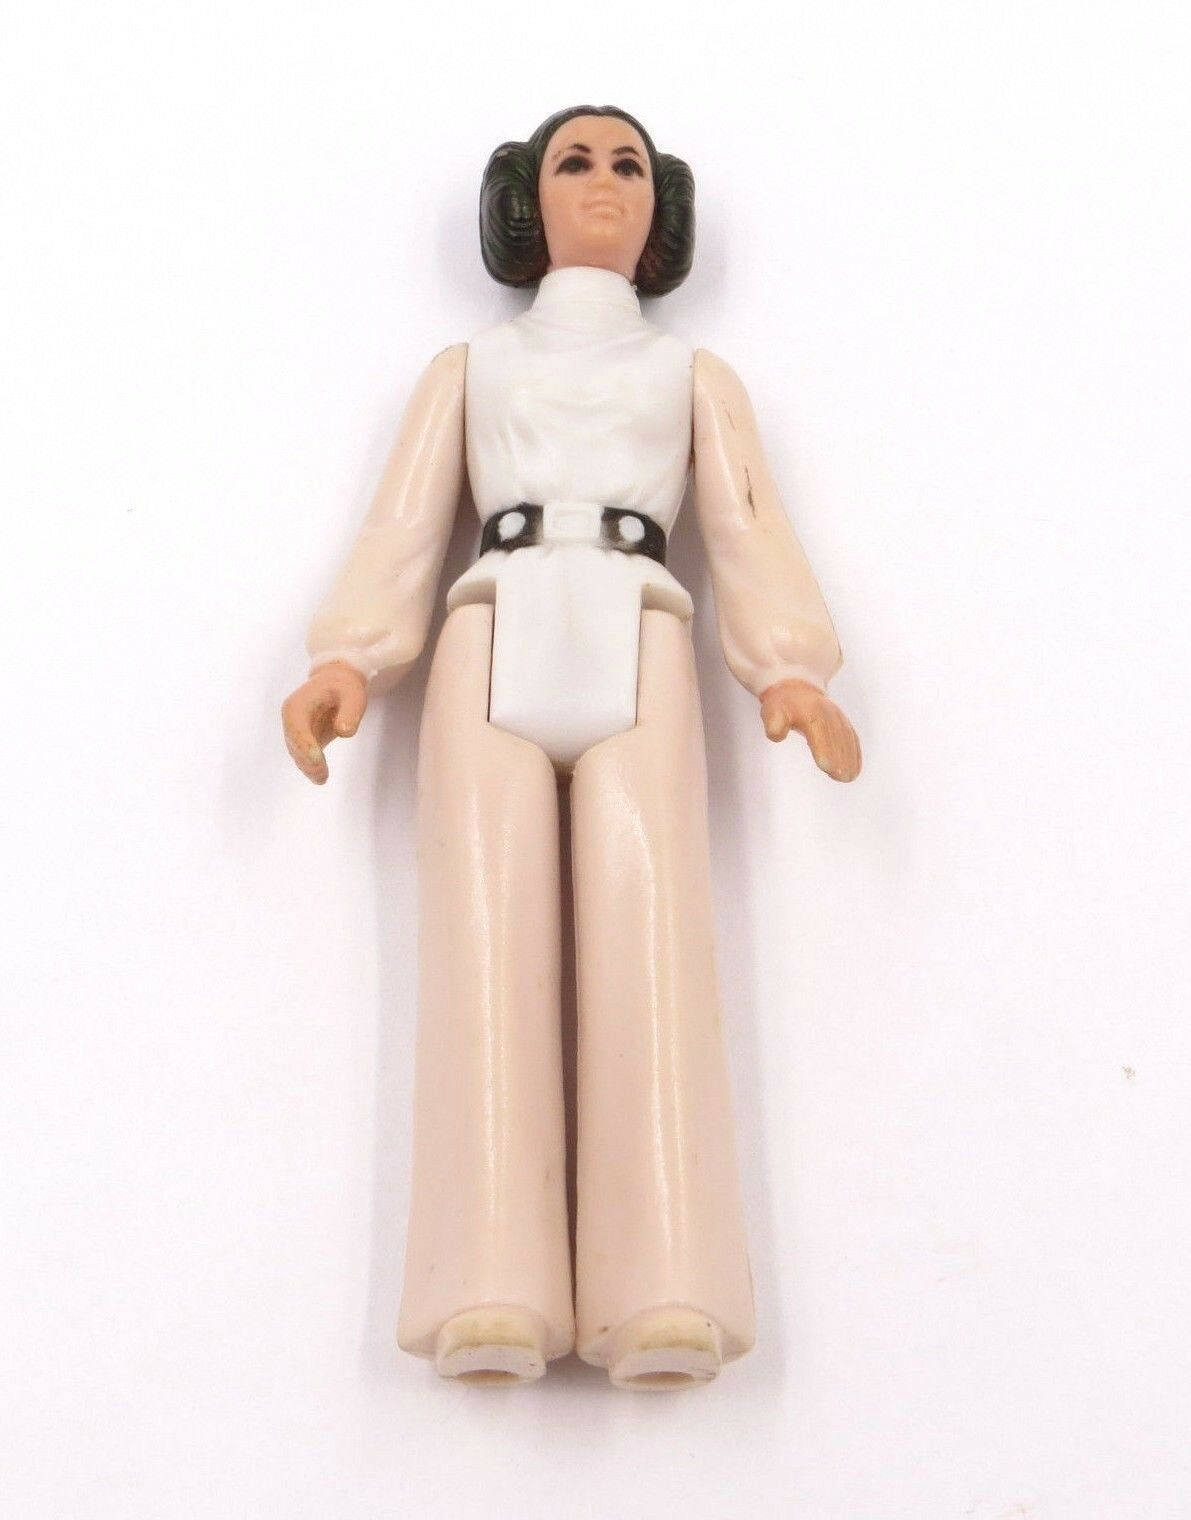 STAR WARS Figure Loose (1977) ANH / Princess Leia (Carrie Fisher) Figurine